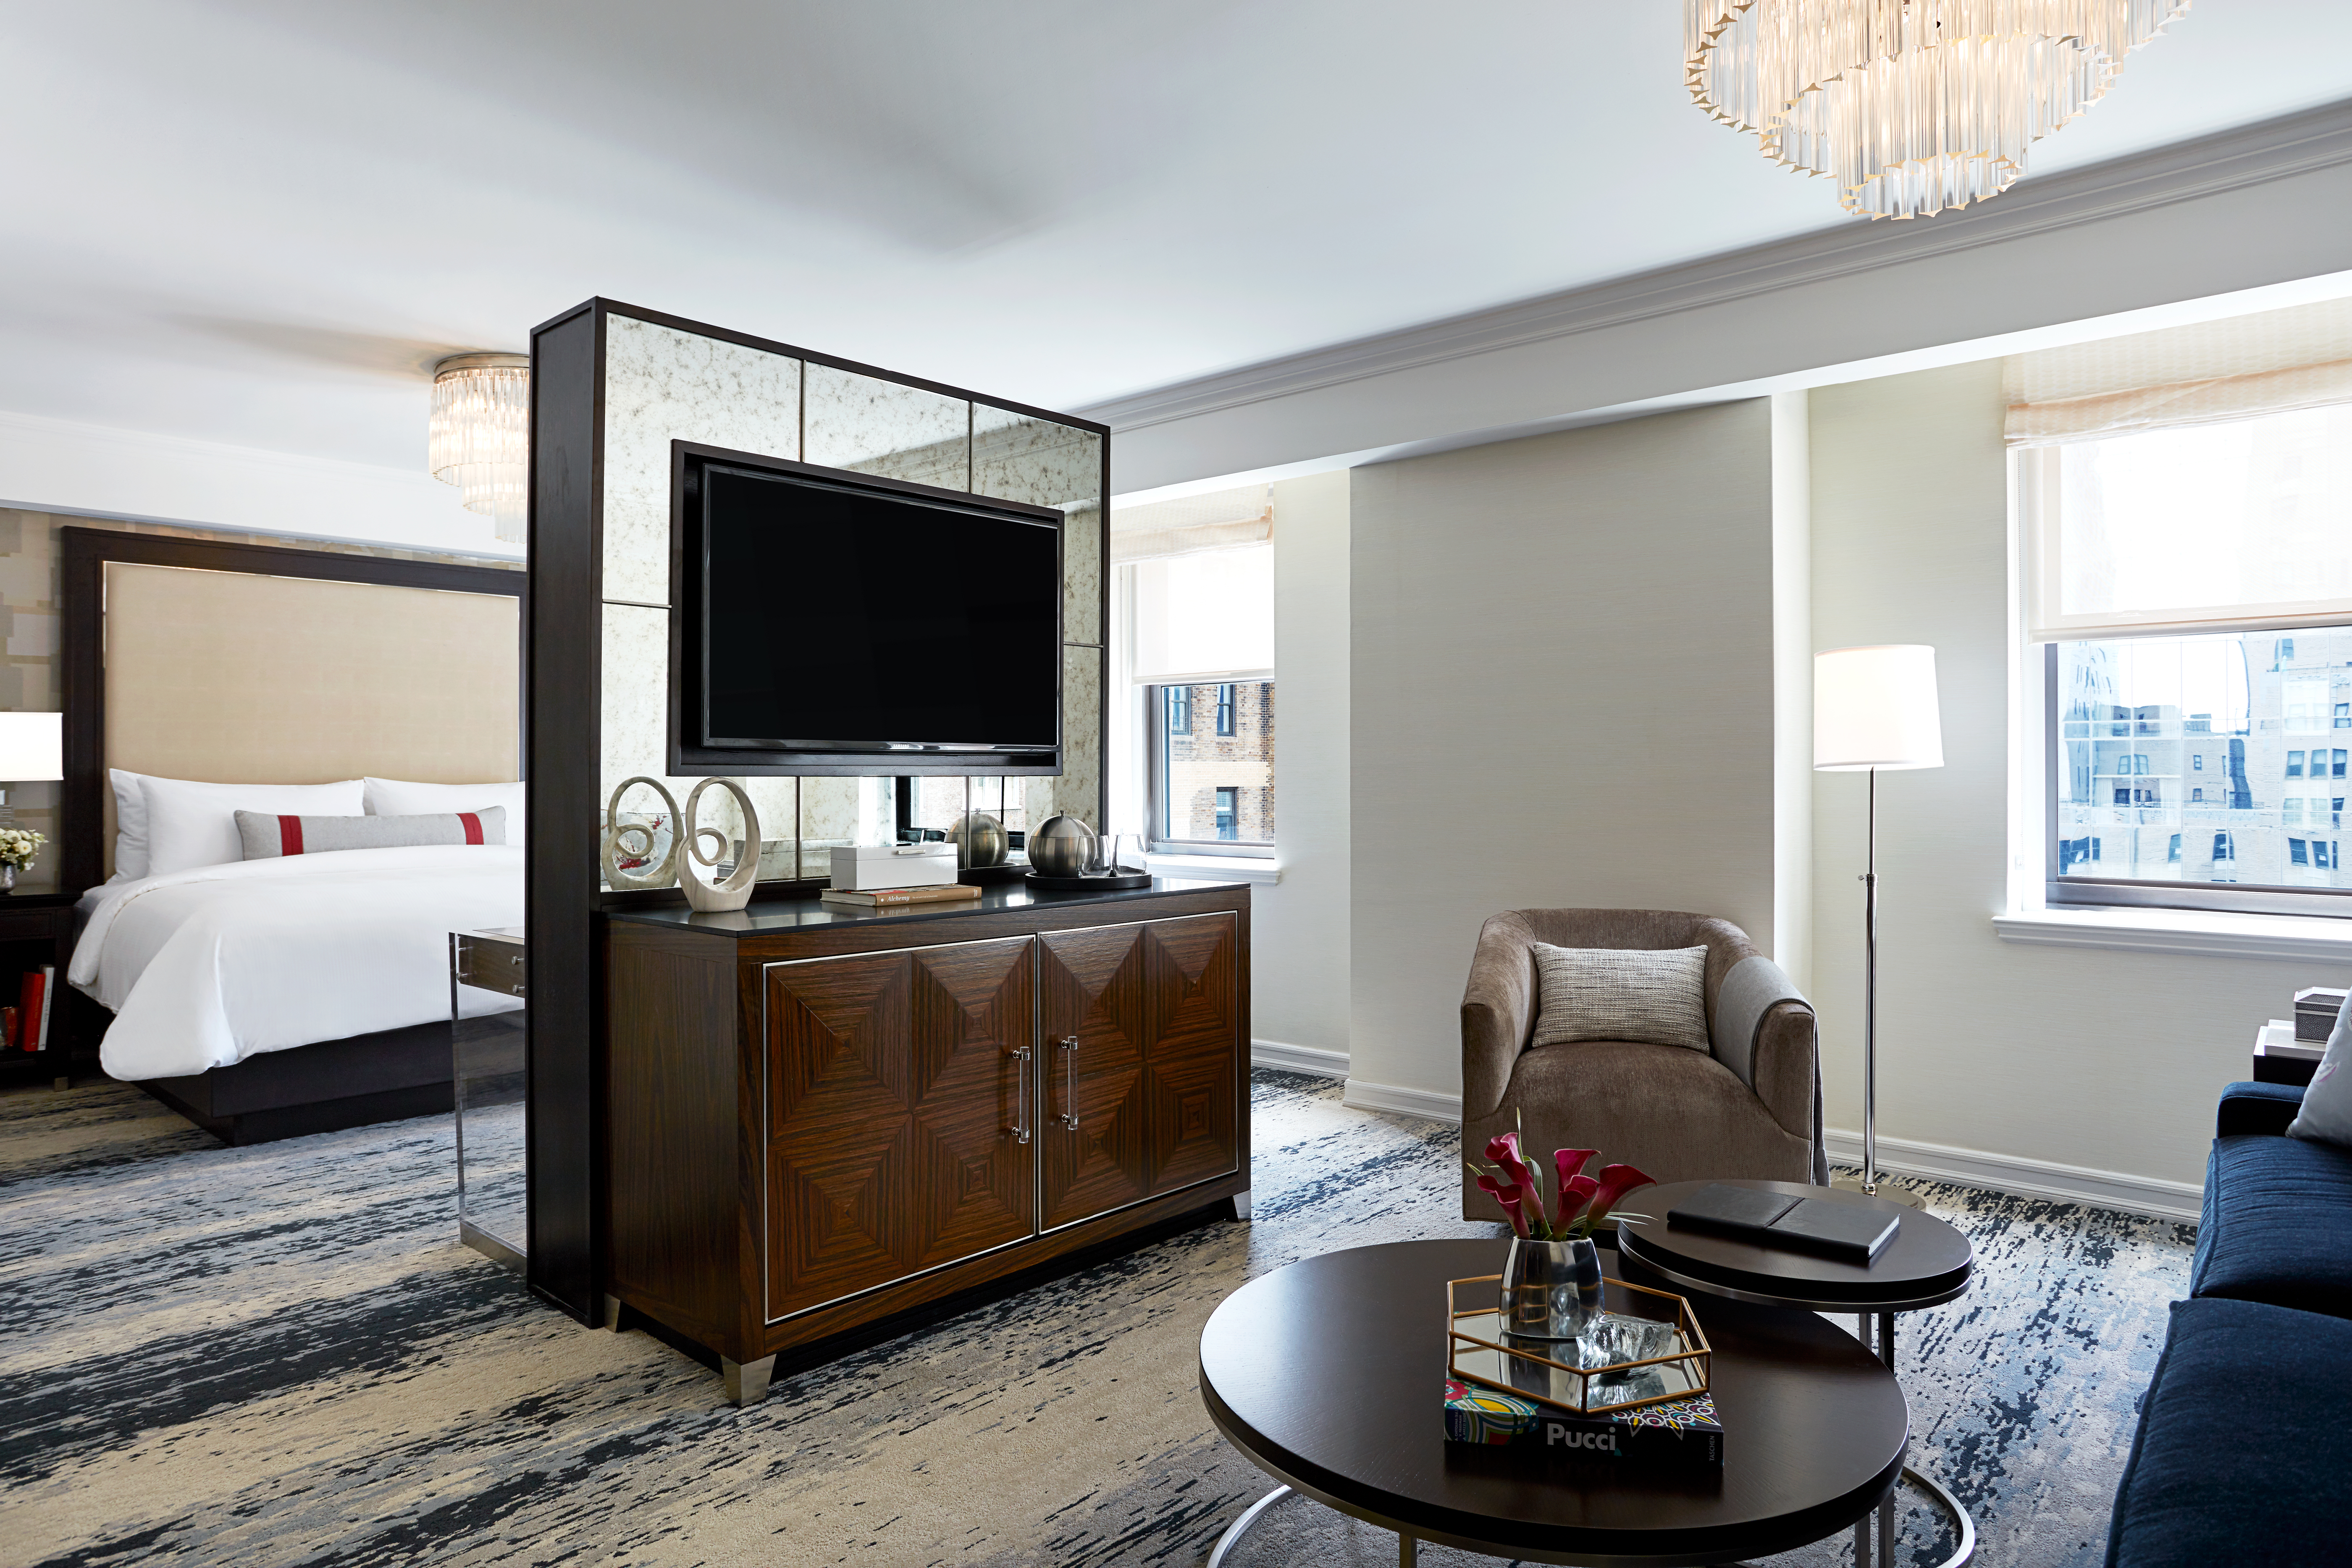 JW Marriott Essex House junior suite